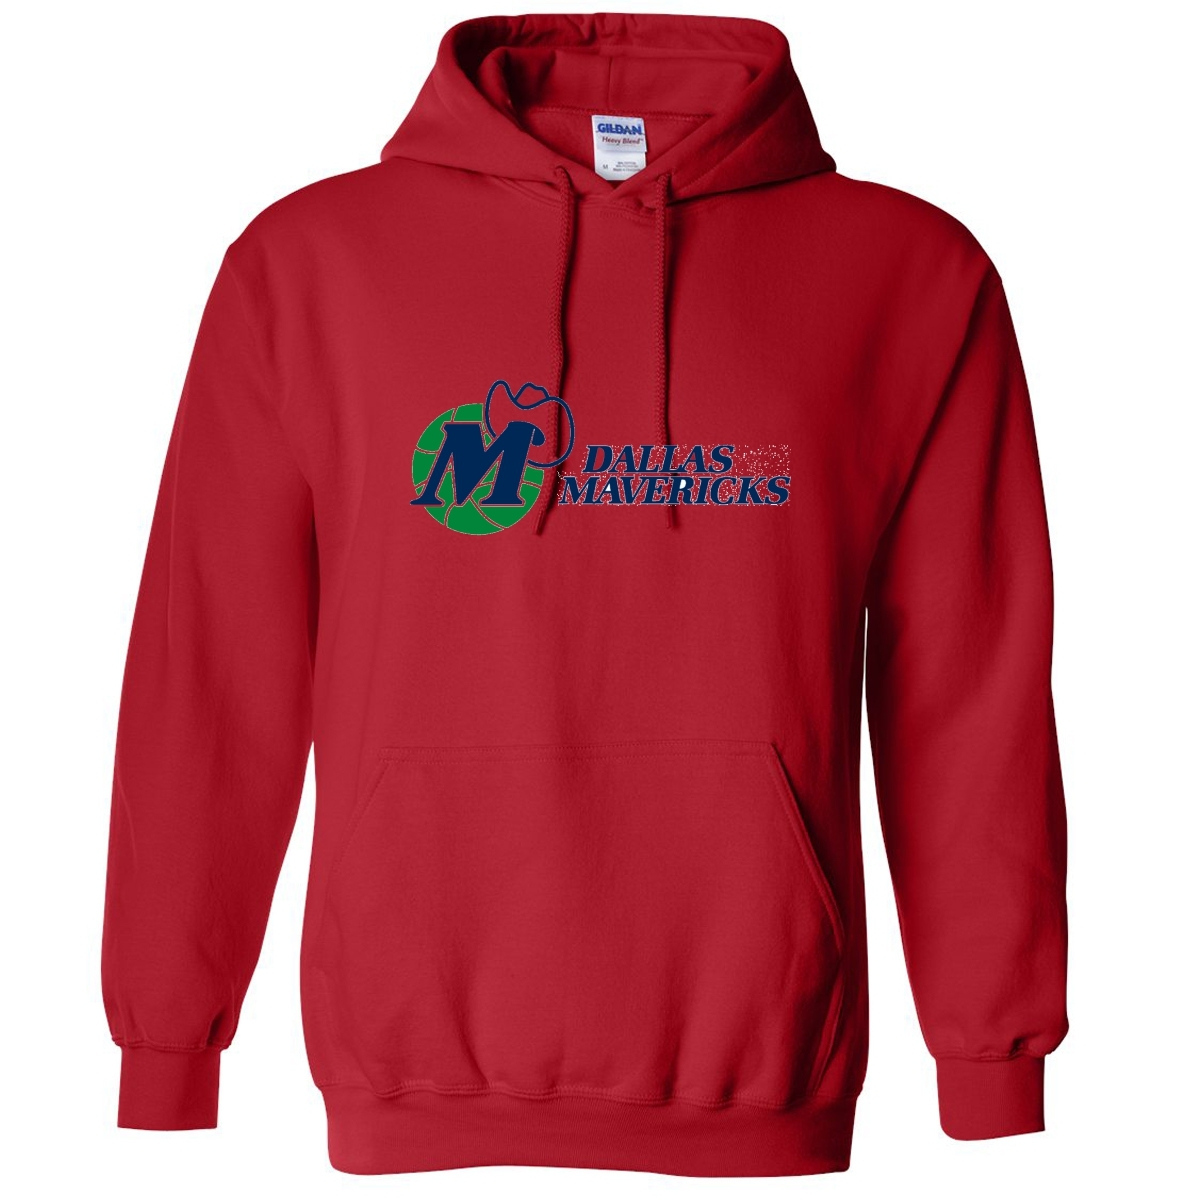 Dallas mavericks hoodies